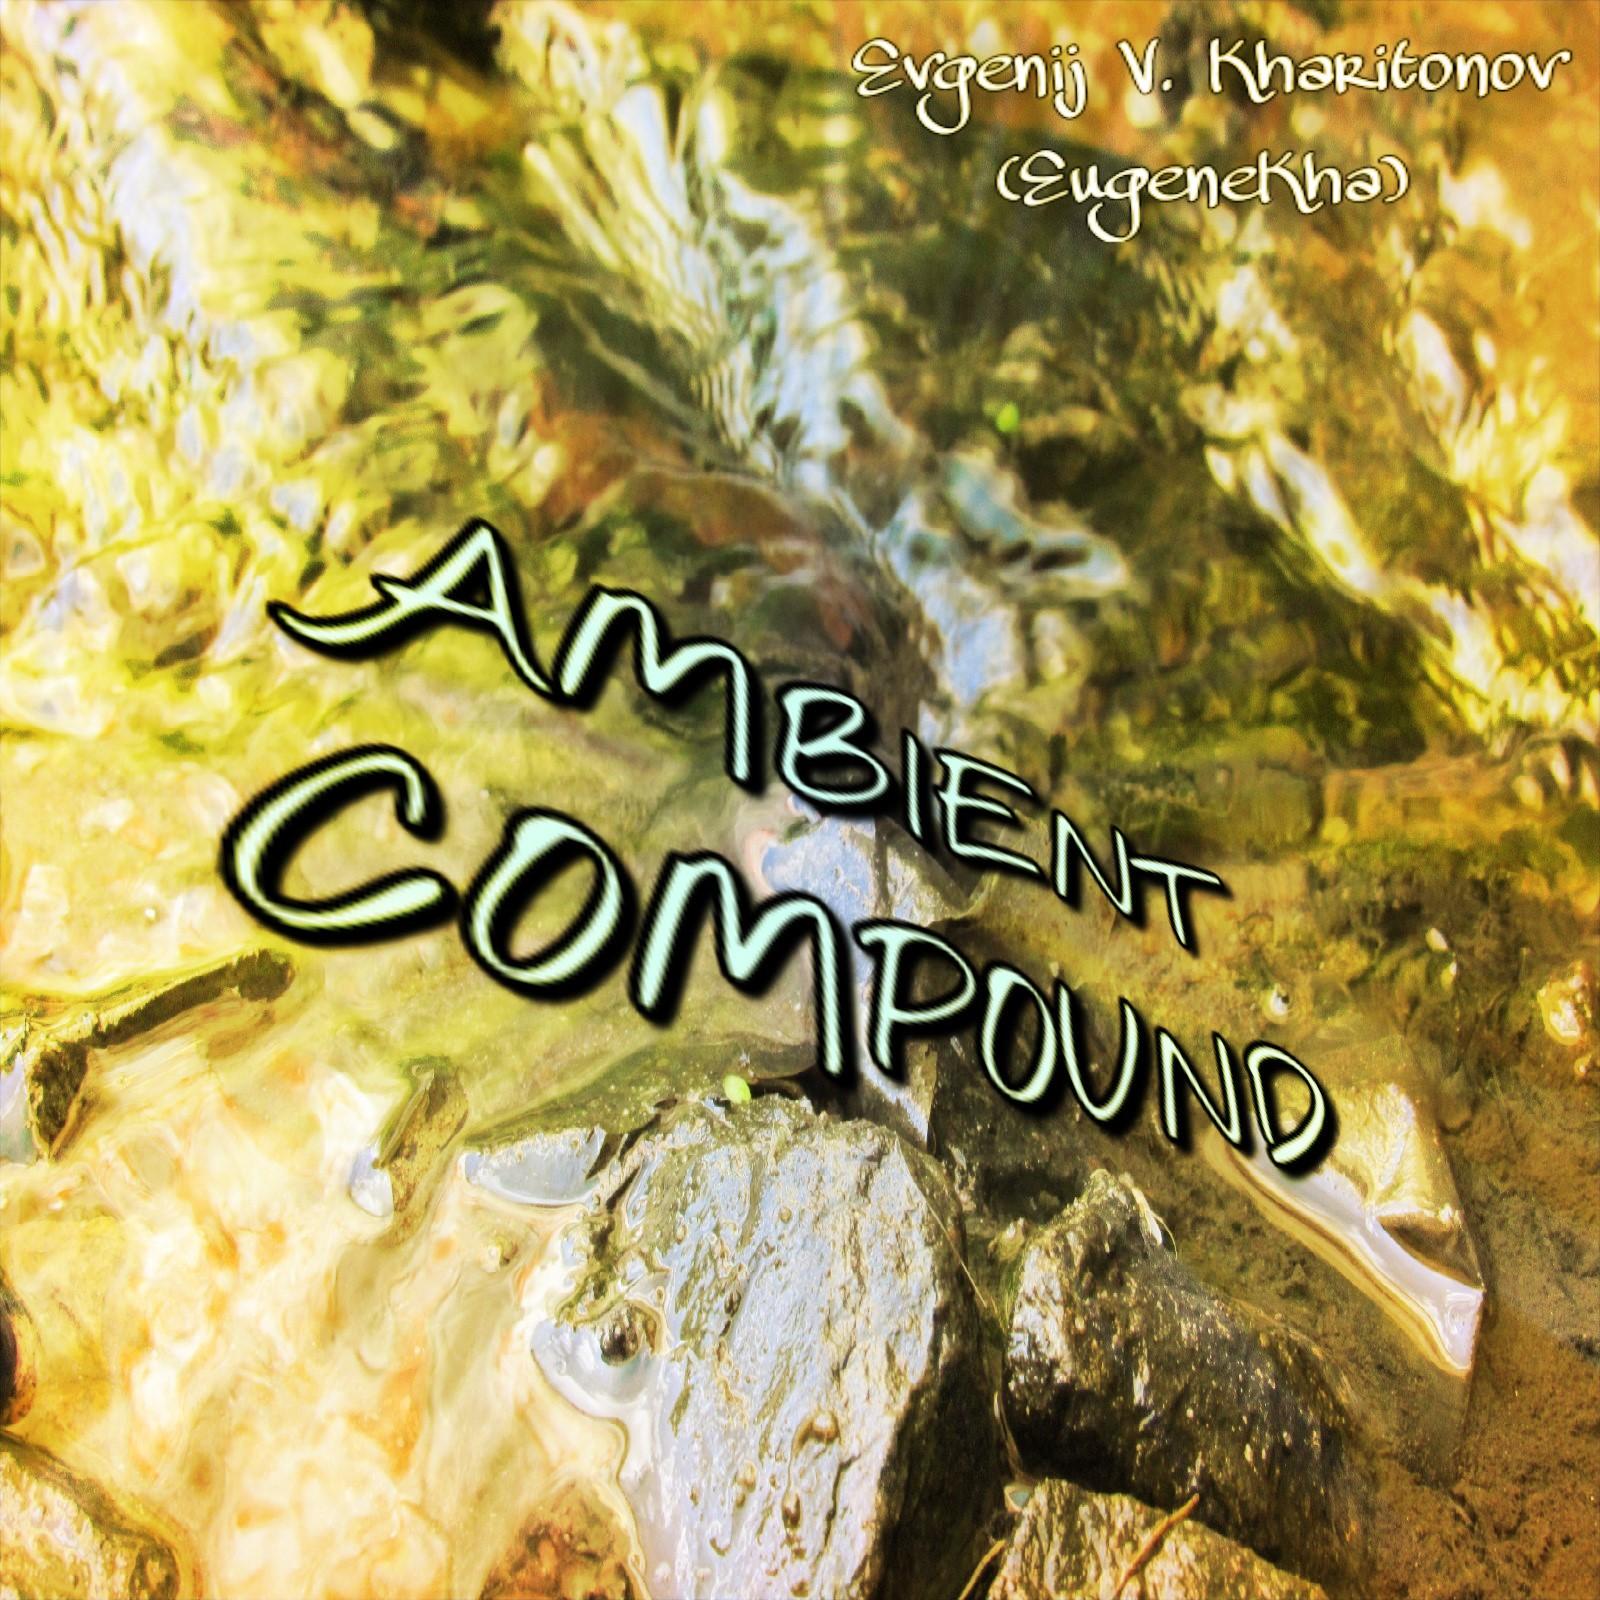 EugeneKha / Evgenij V  Kharitonov: Ambient Compounds